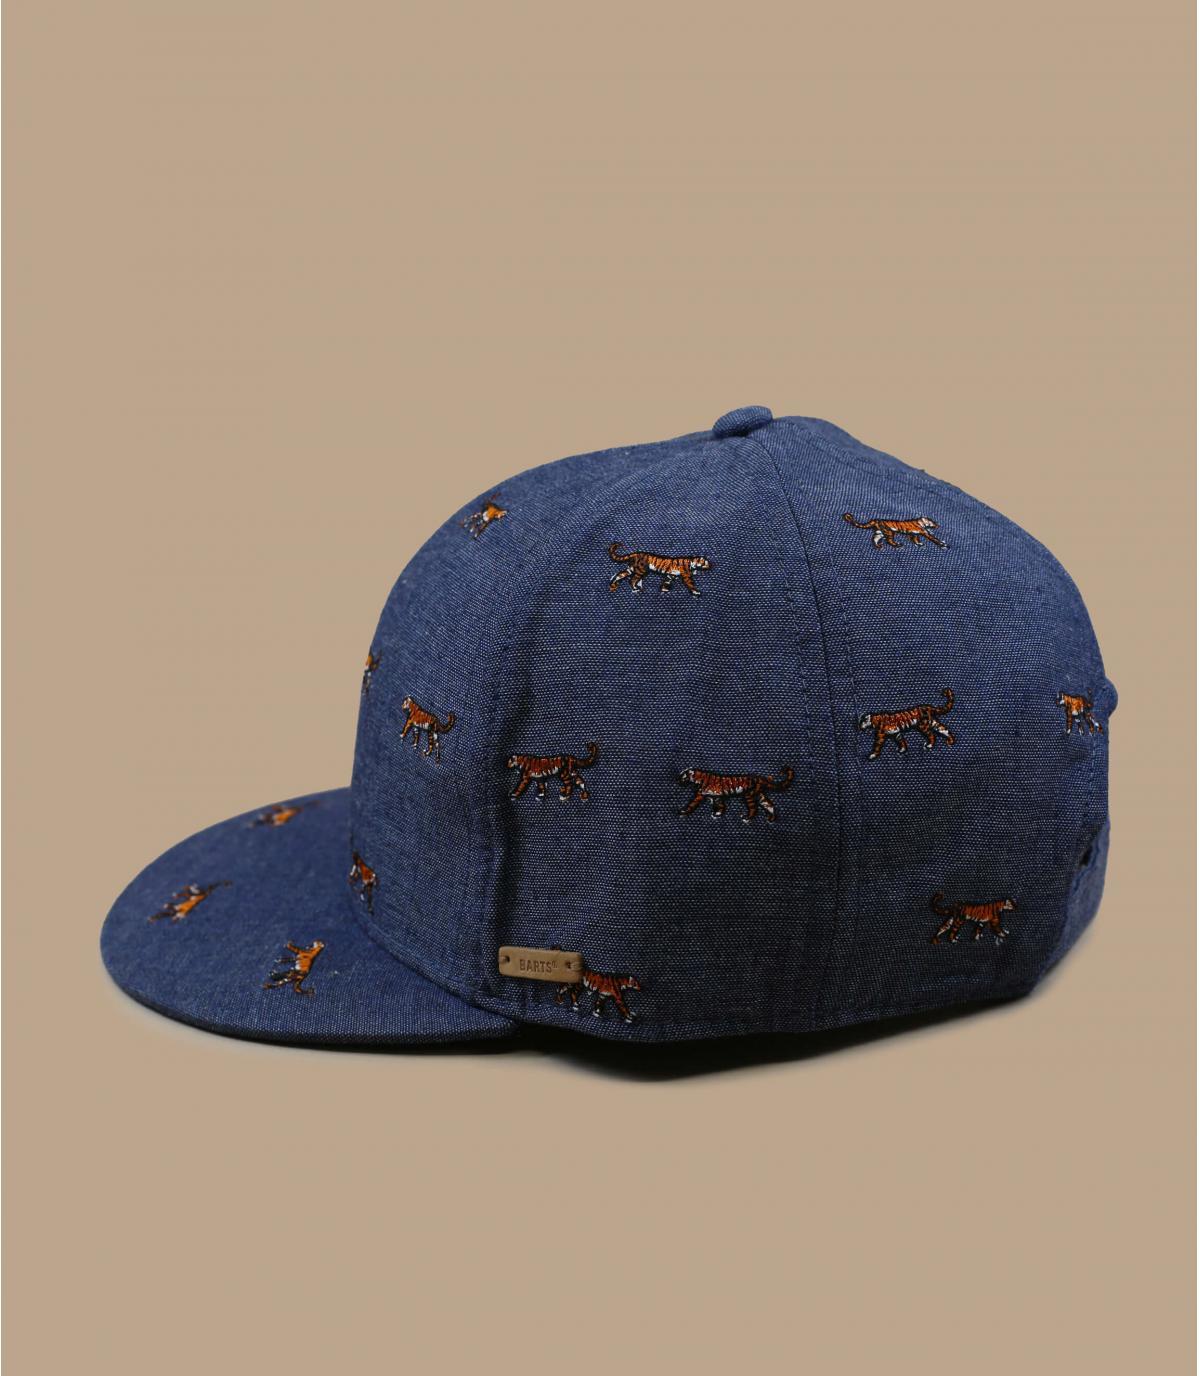 casquette tigres enfant